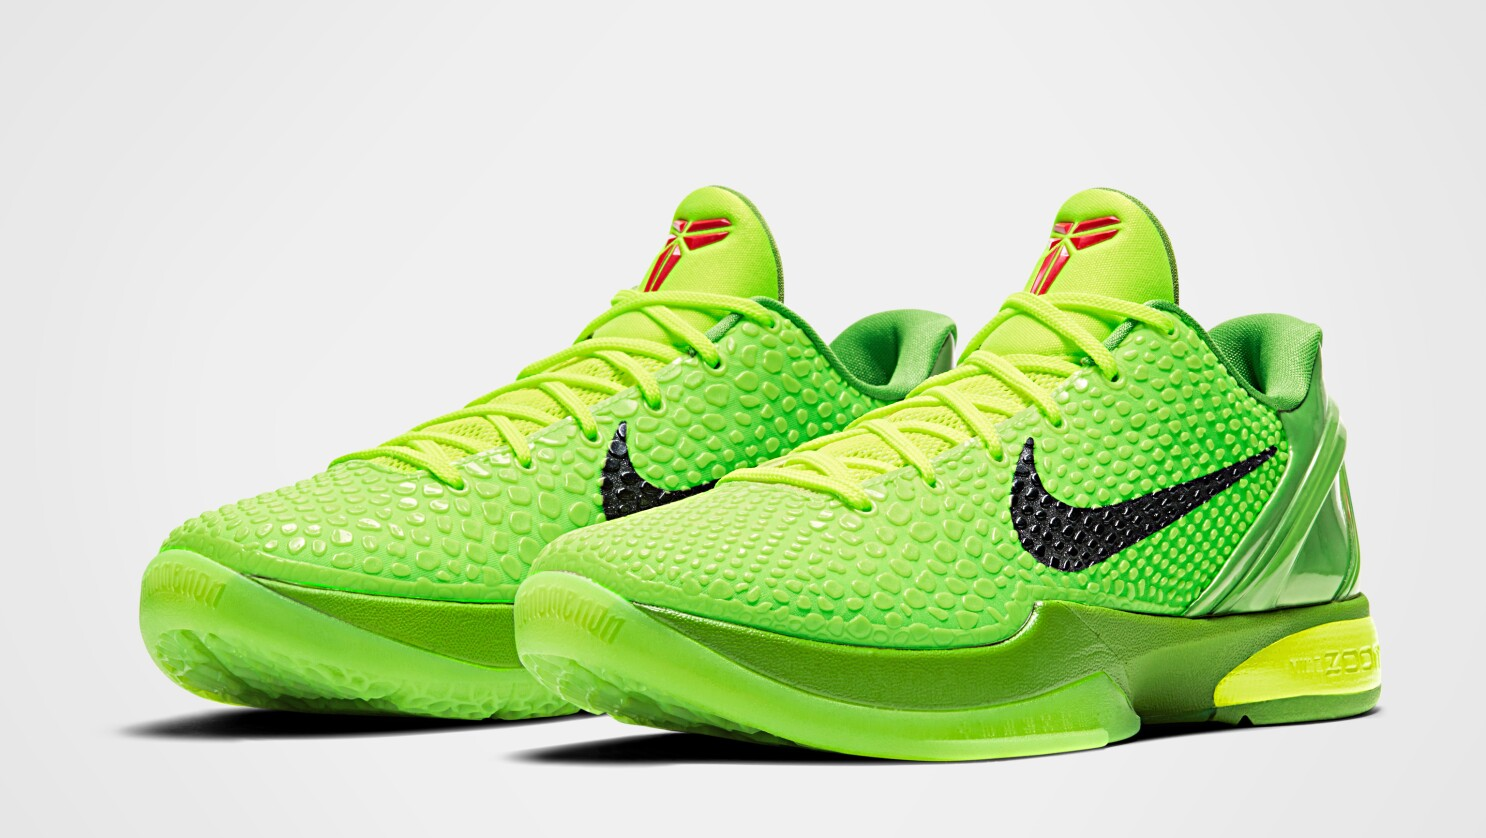 Escepticismo mitología Prevención  Nike Kobe 6 'Grinch' sneaker set to drop Christmas Eve - Los Angeles Times